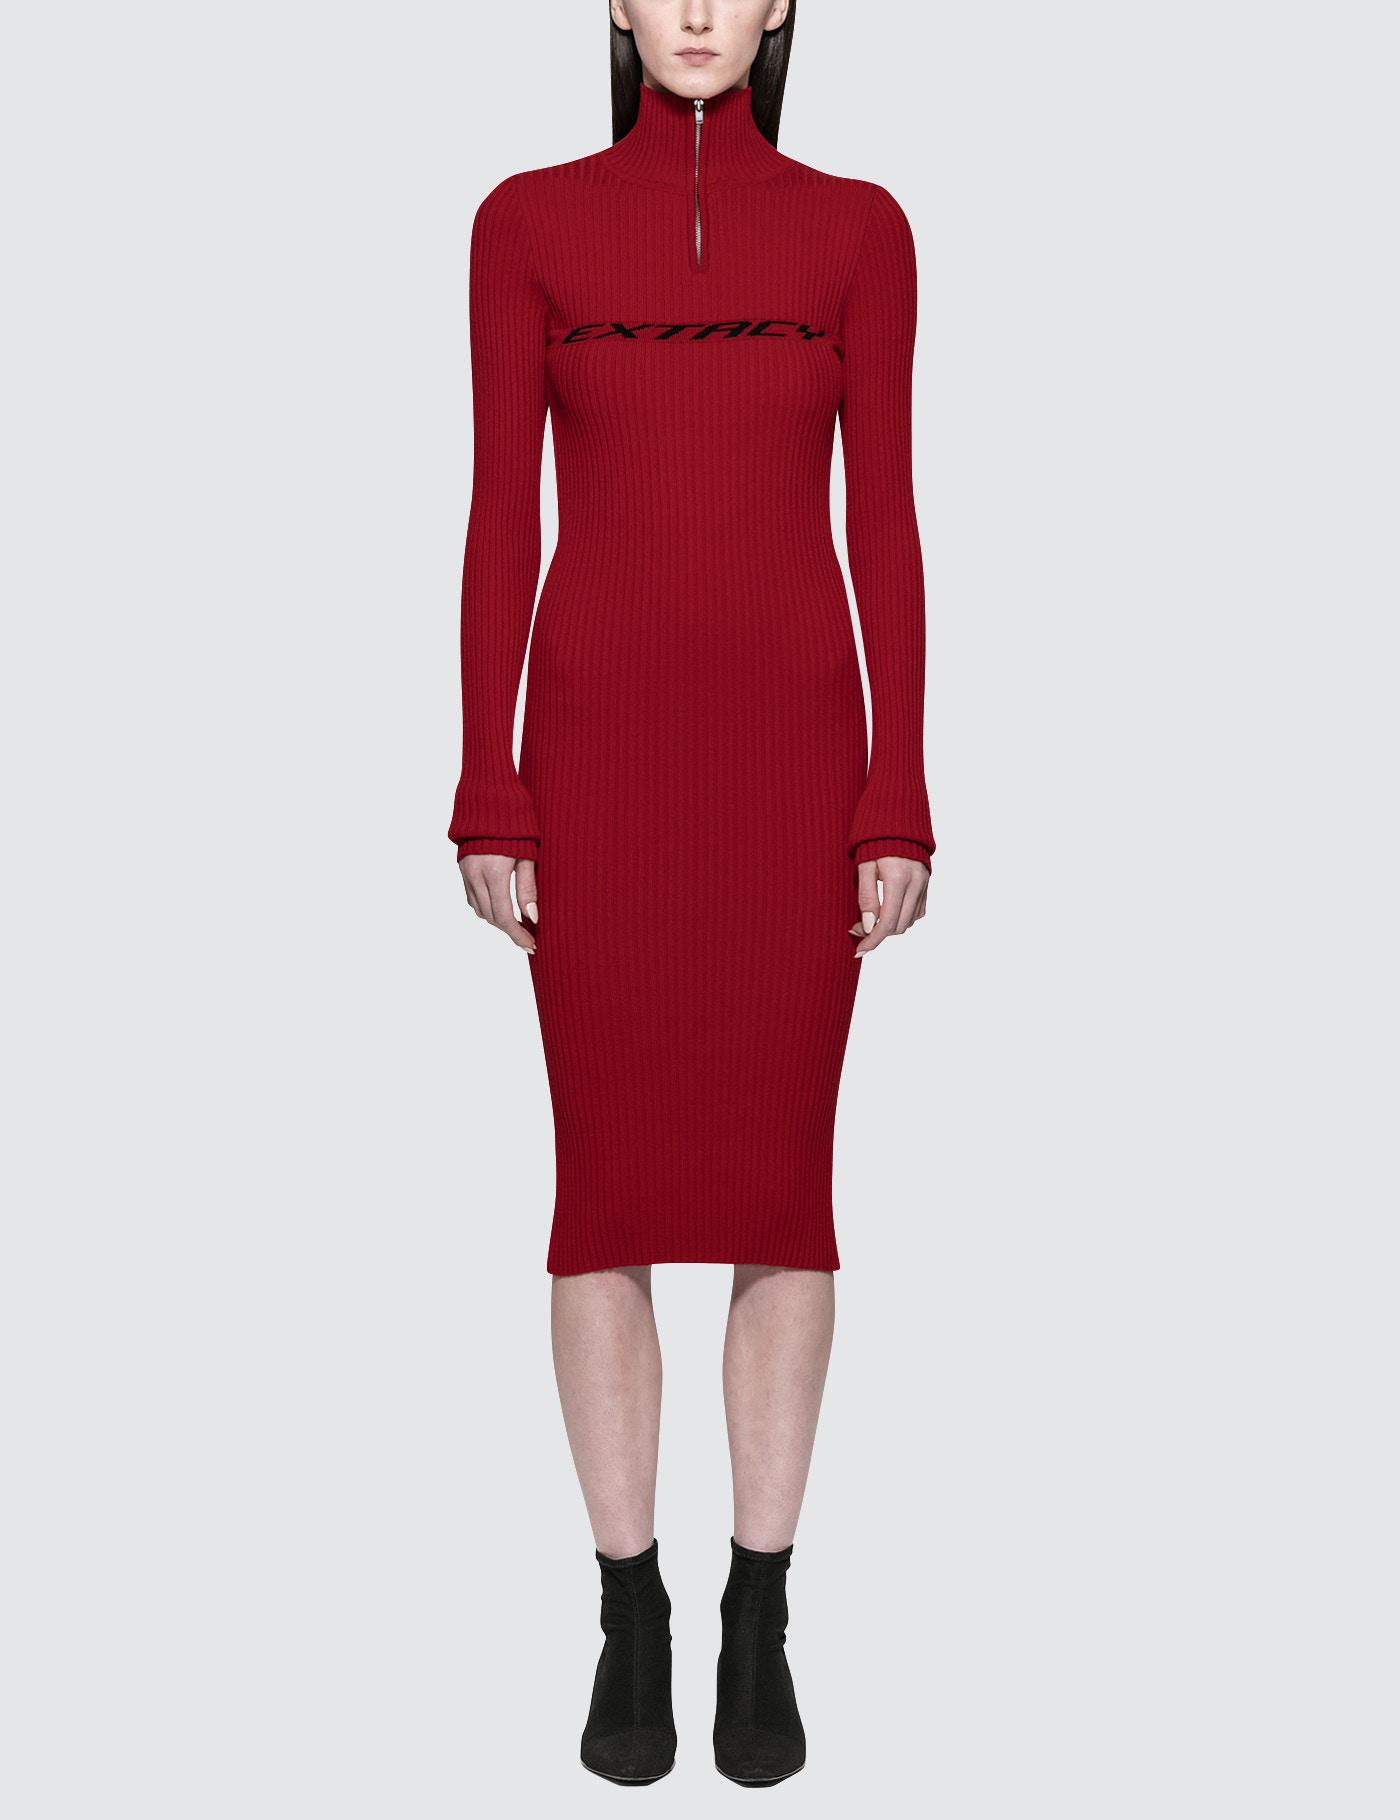 Lyst m i s b h v extacy half zip dress in red misbhv womens red extacy voltagebd Gallery